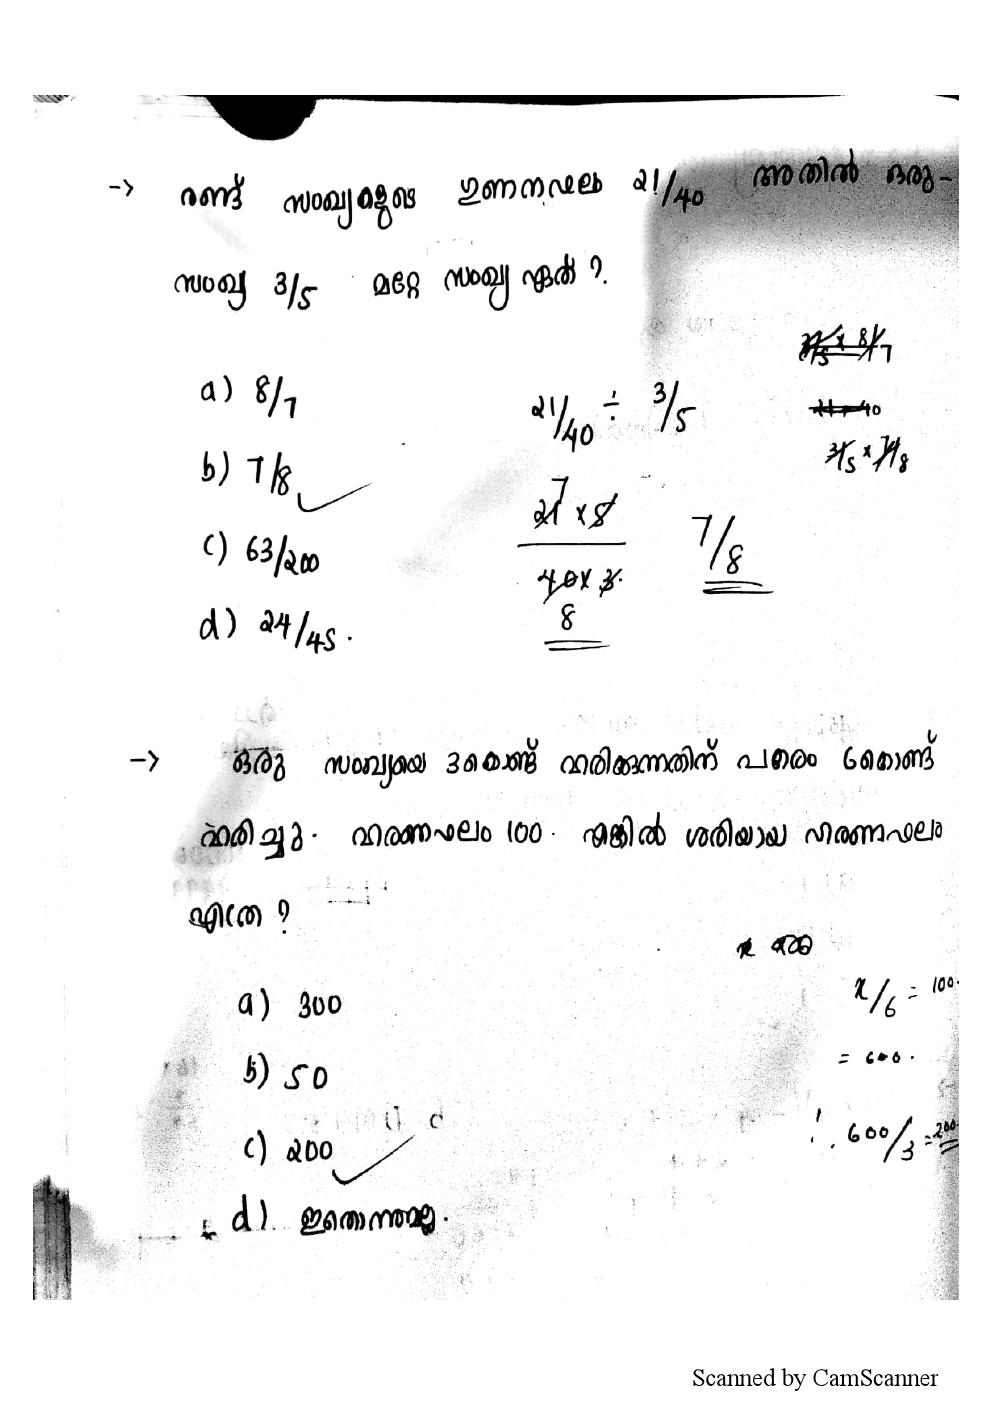 http://masterstudy.net/pdf/ktet_notes0023.png